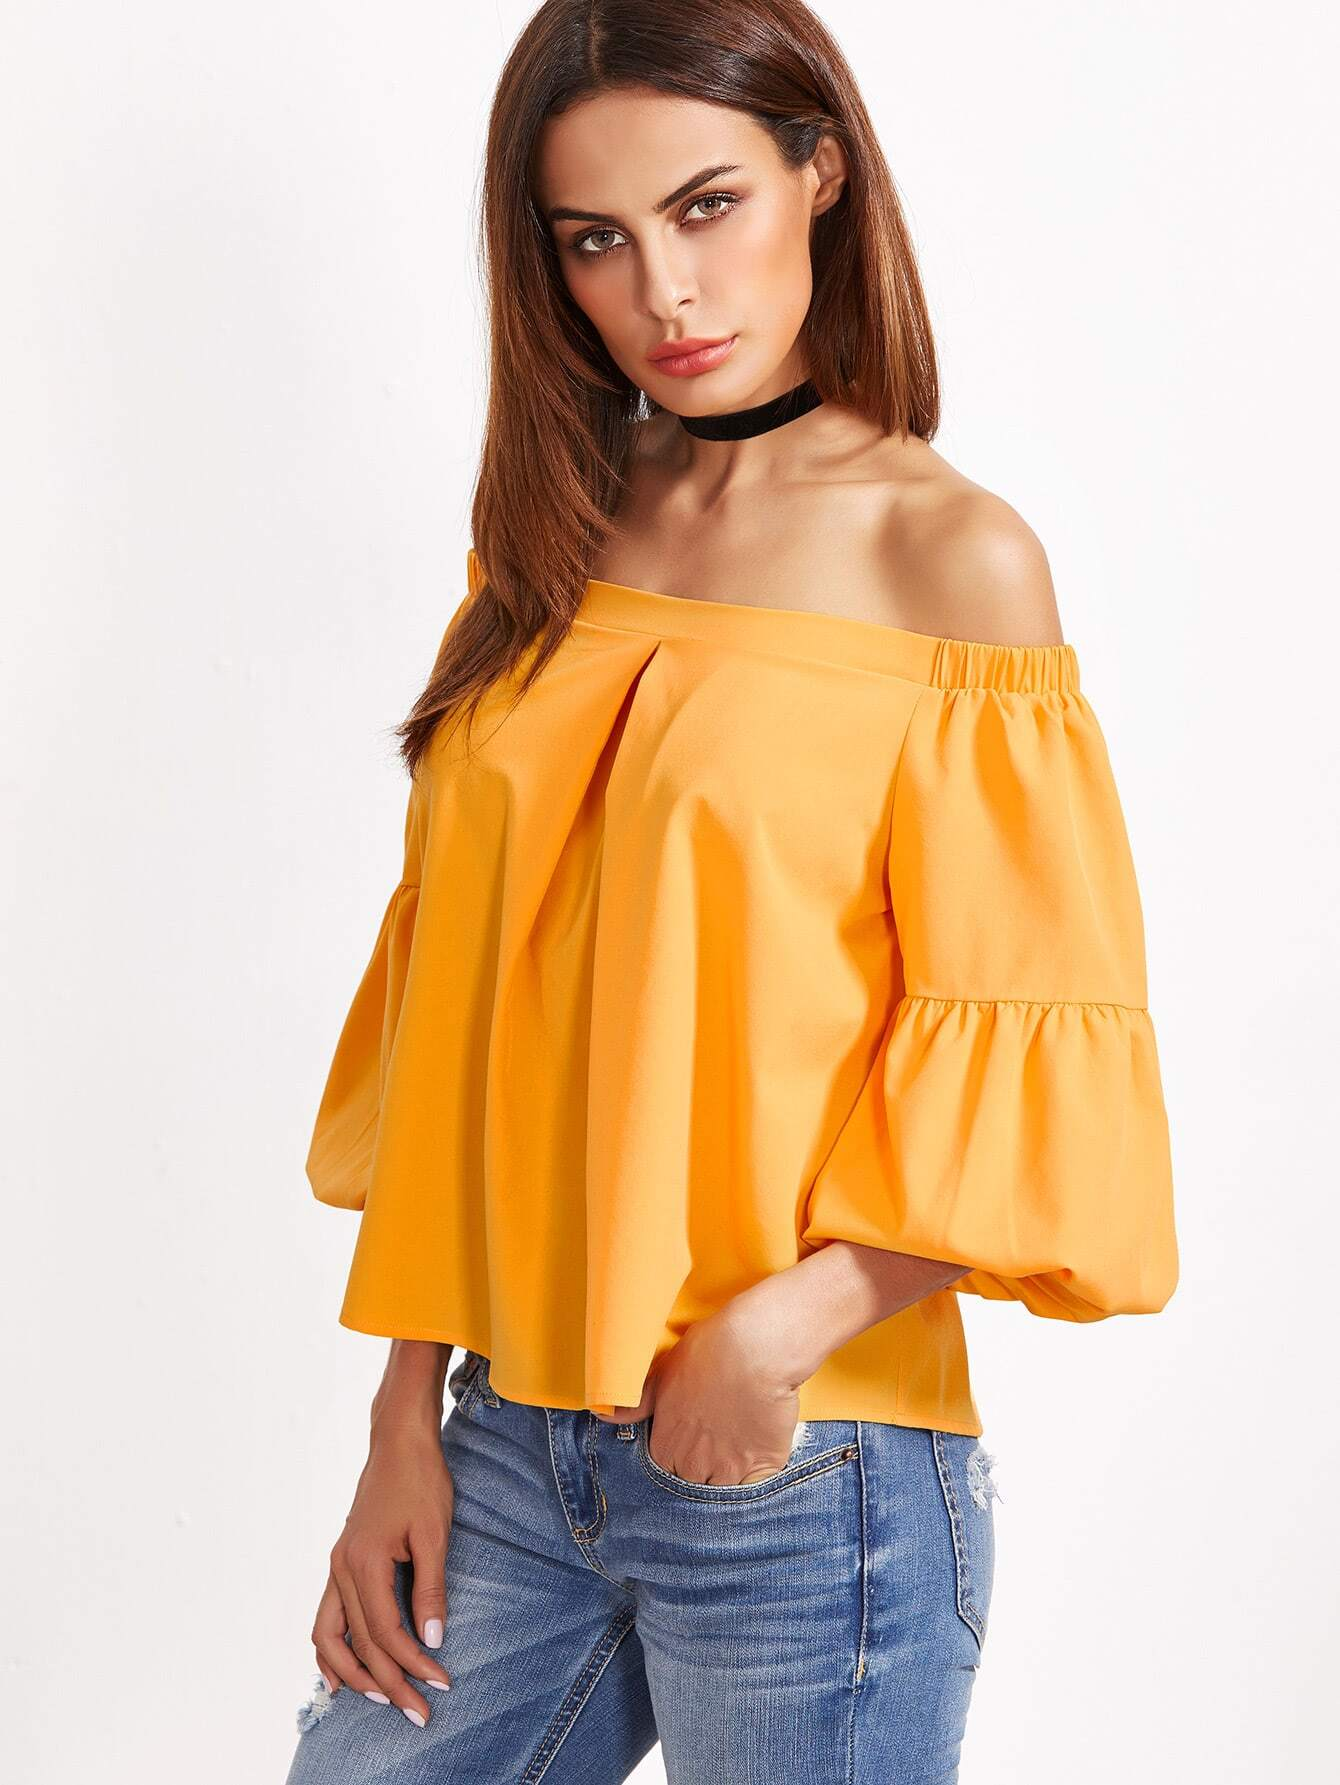 blouse161209702_2